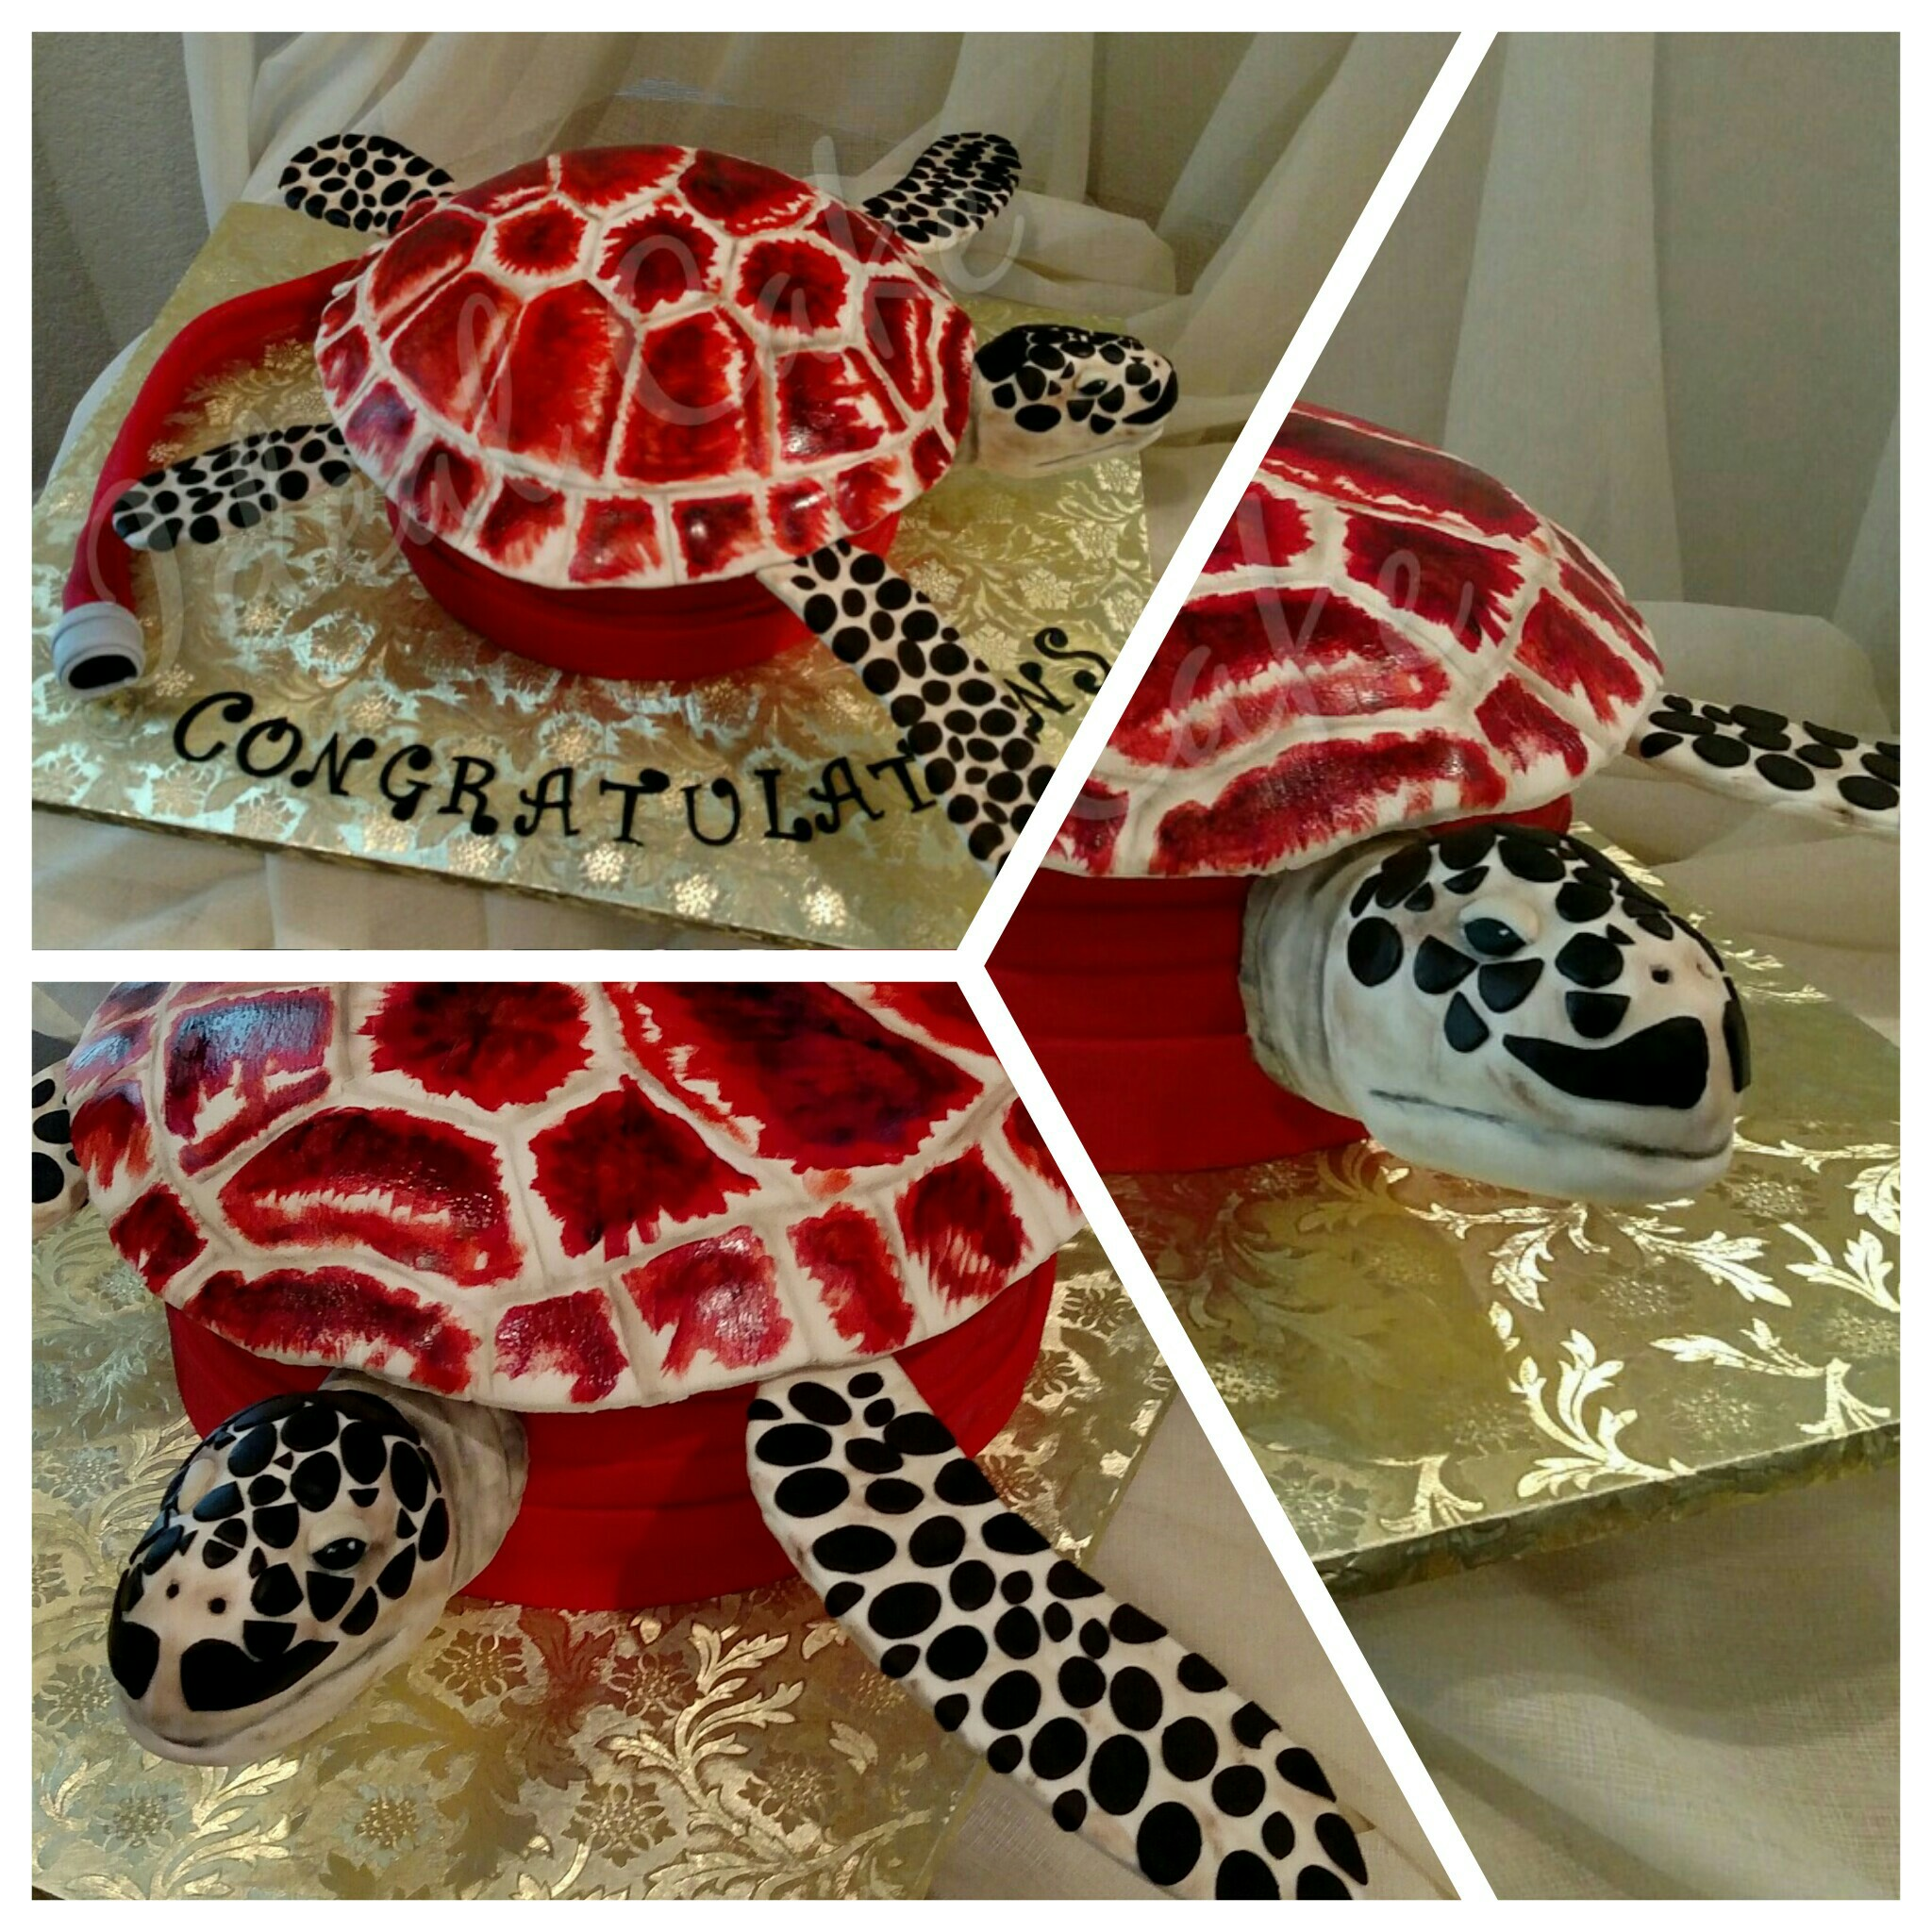 Fireman's Turtle